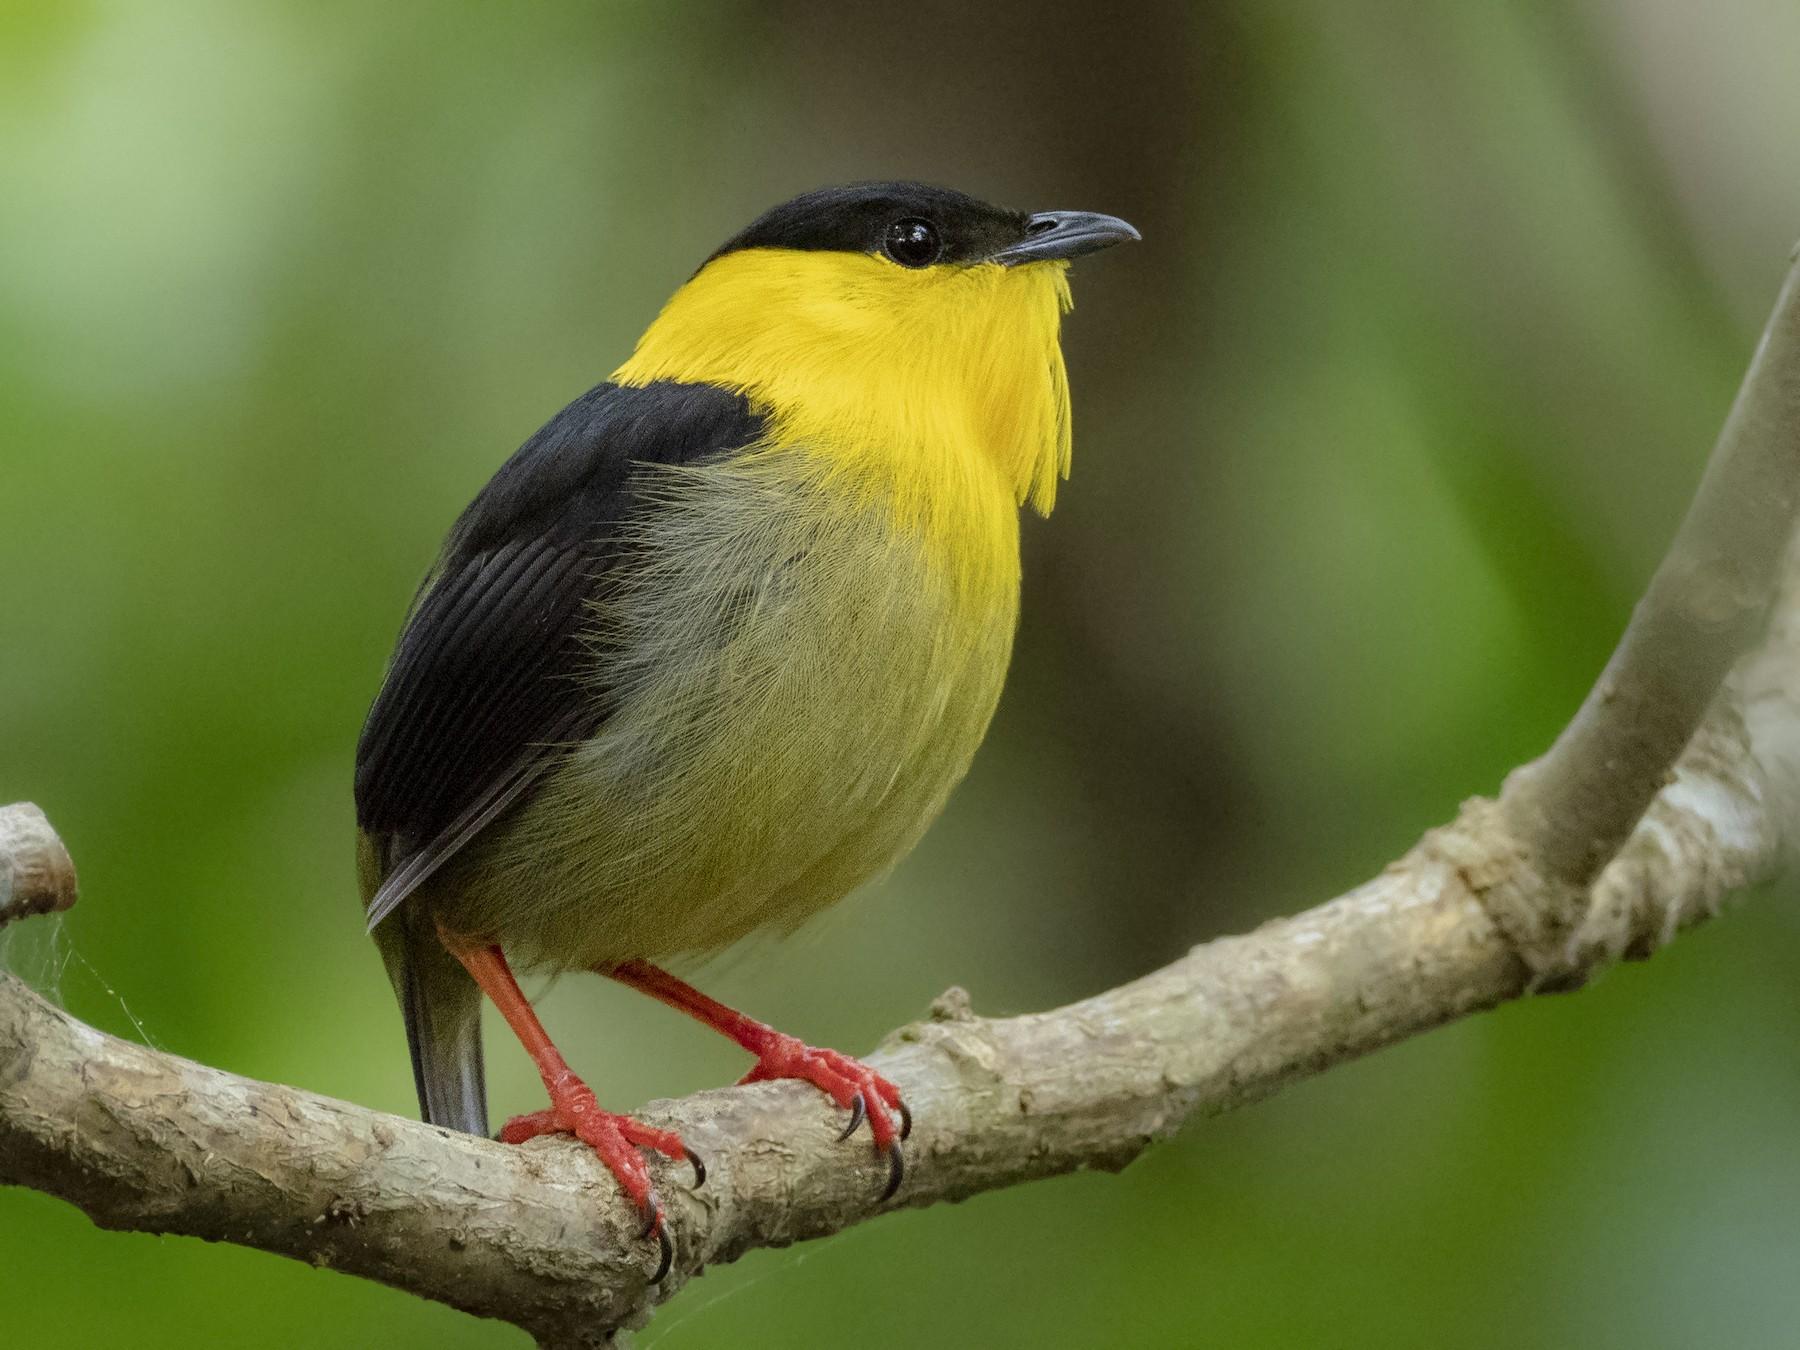 Golden-collared Manakin - eBird